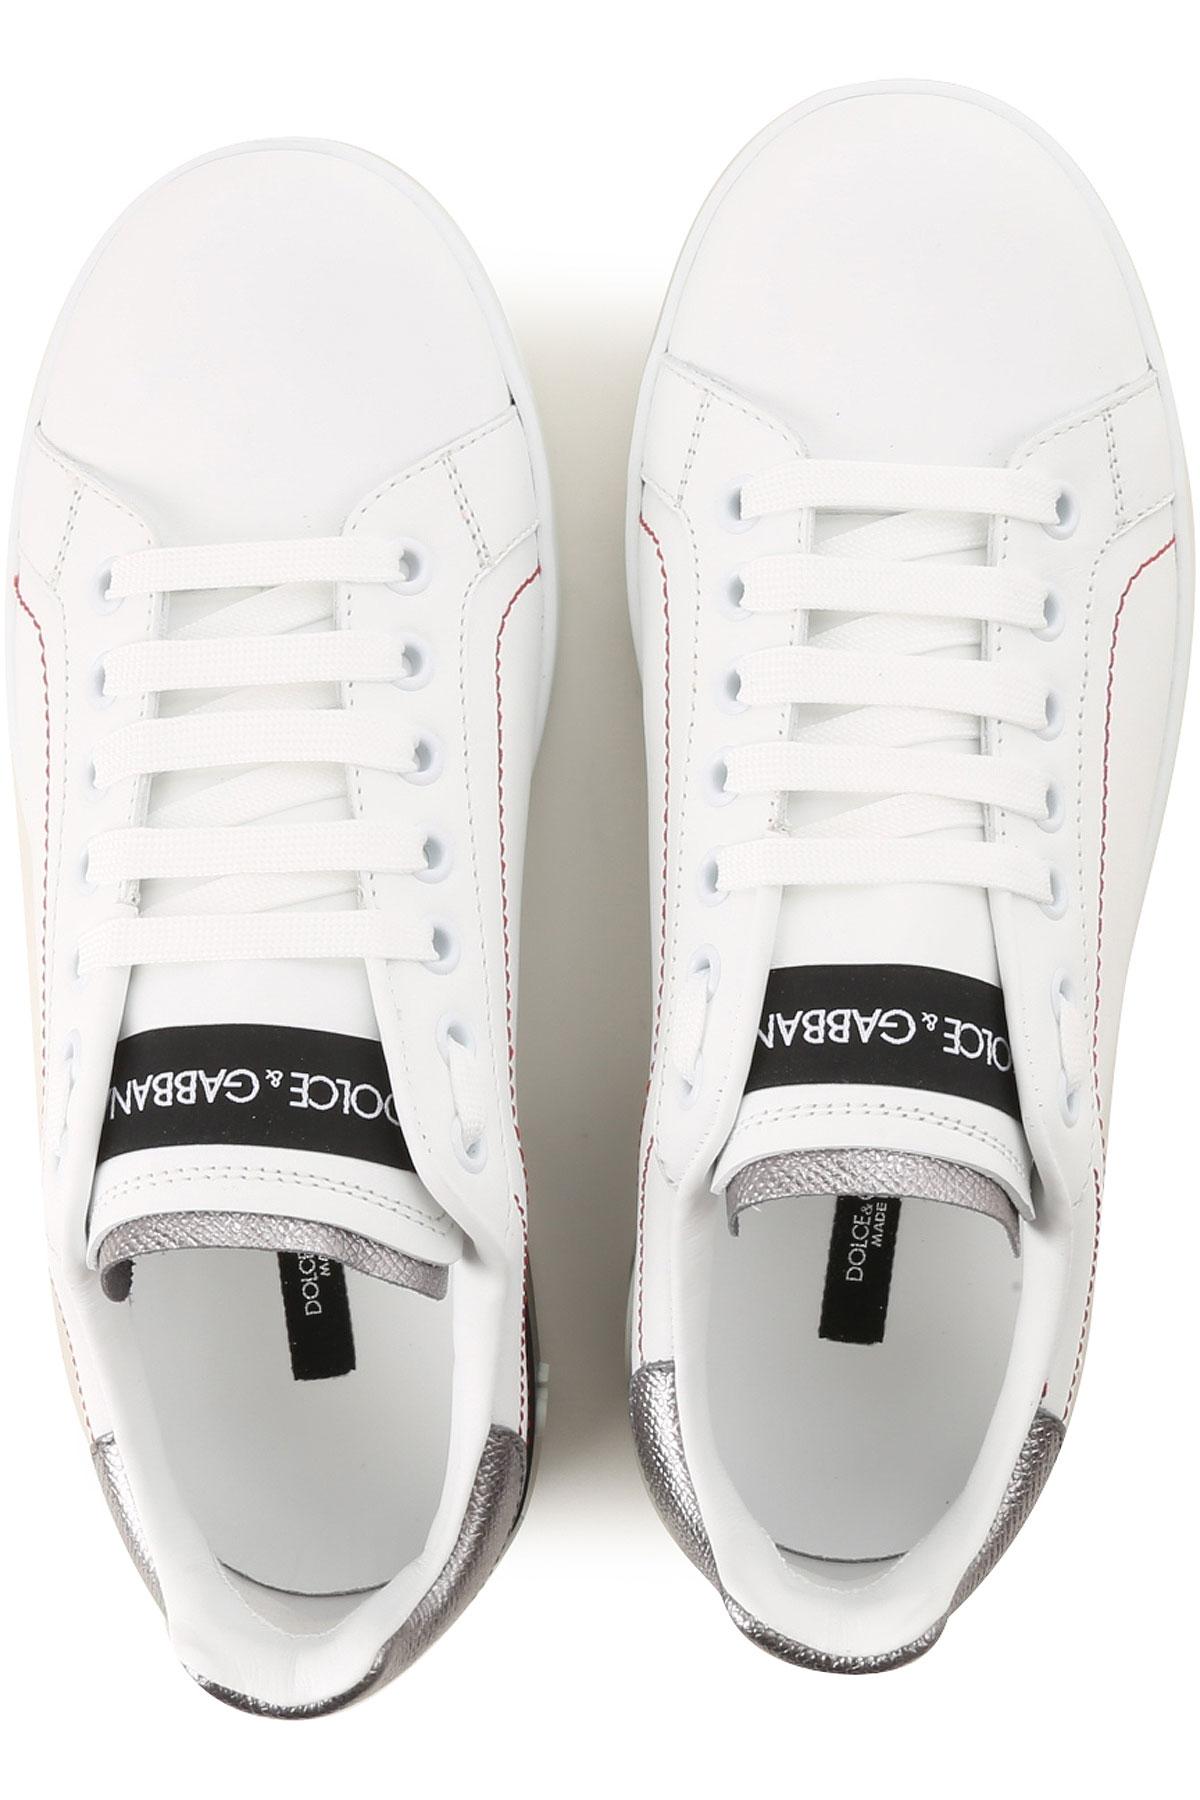 Blanco Primavera Mujer Para Negro verano Dolce Gabbana Zapatos amp; nbsp;plata 2019 8WXT44wpqn